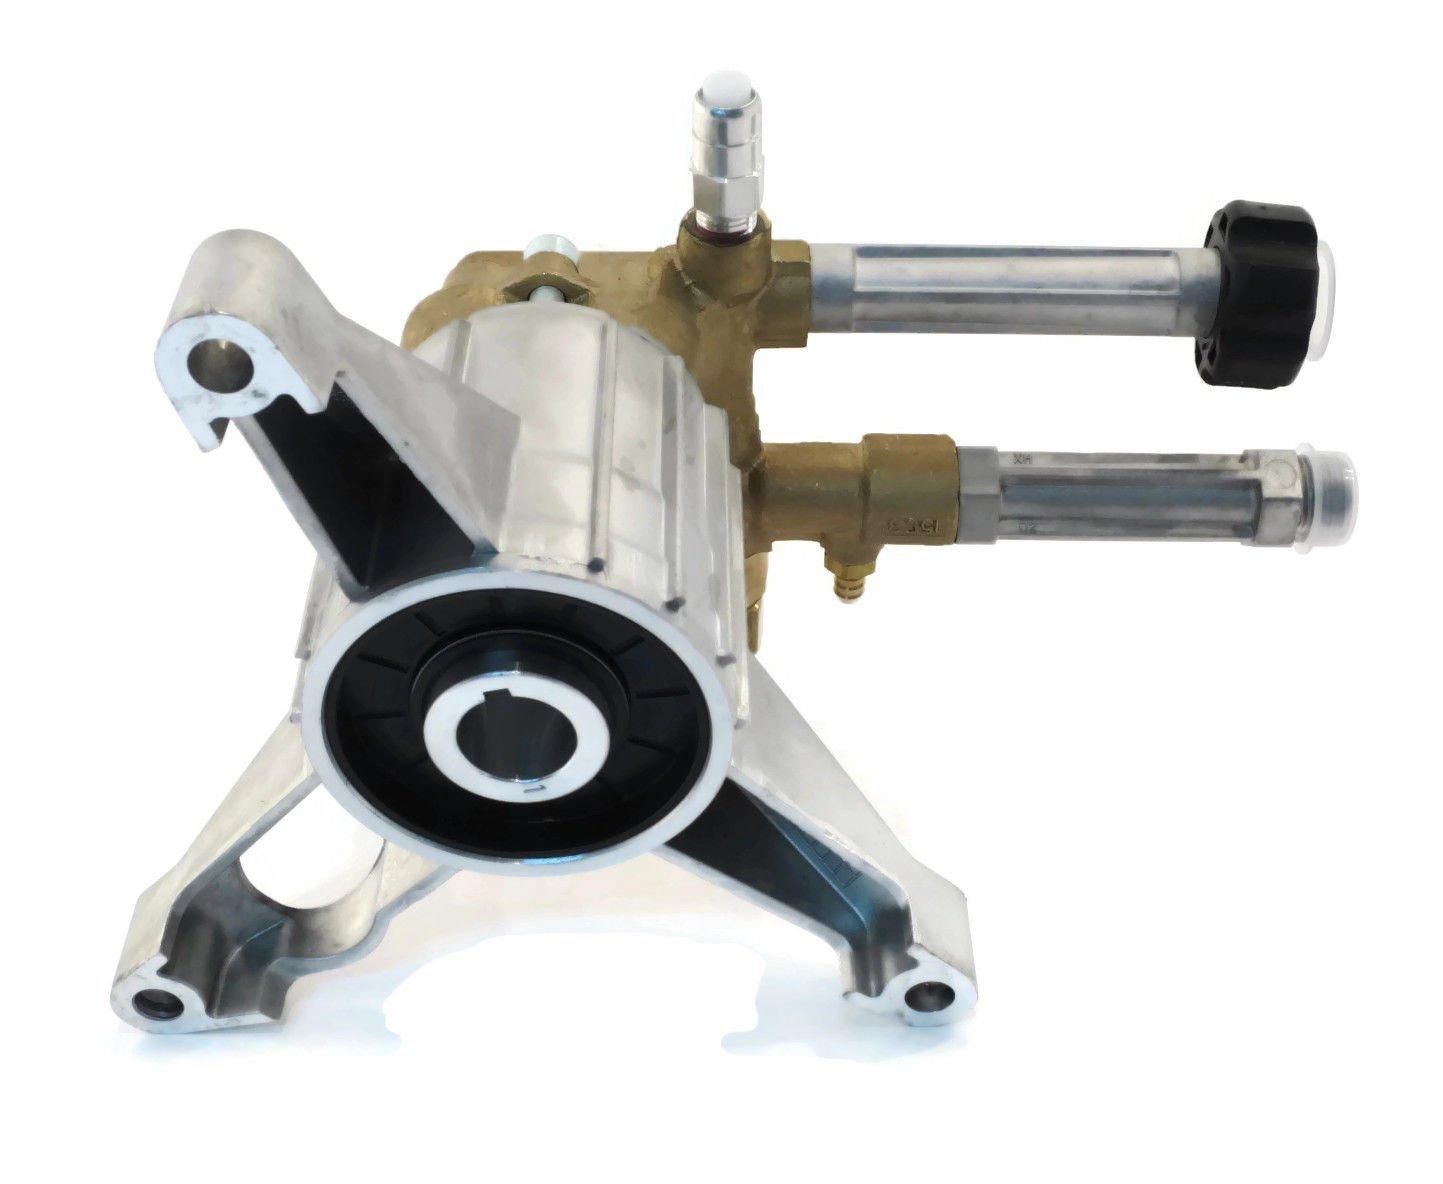 Annovi Reverberi RMW25G28-EZ 2800 Psi, Brass Triplex Plunger Pumps, with EZ Start by Annovi Reverberi